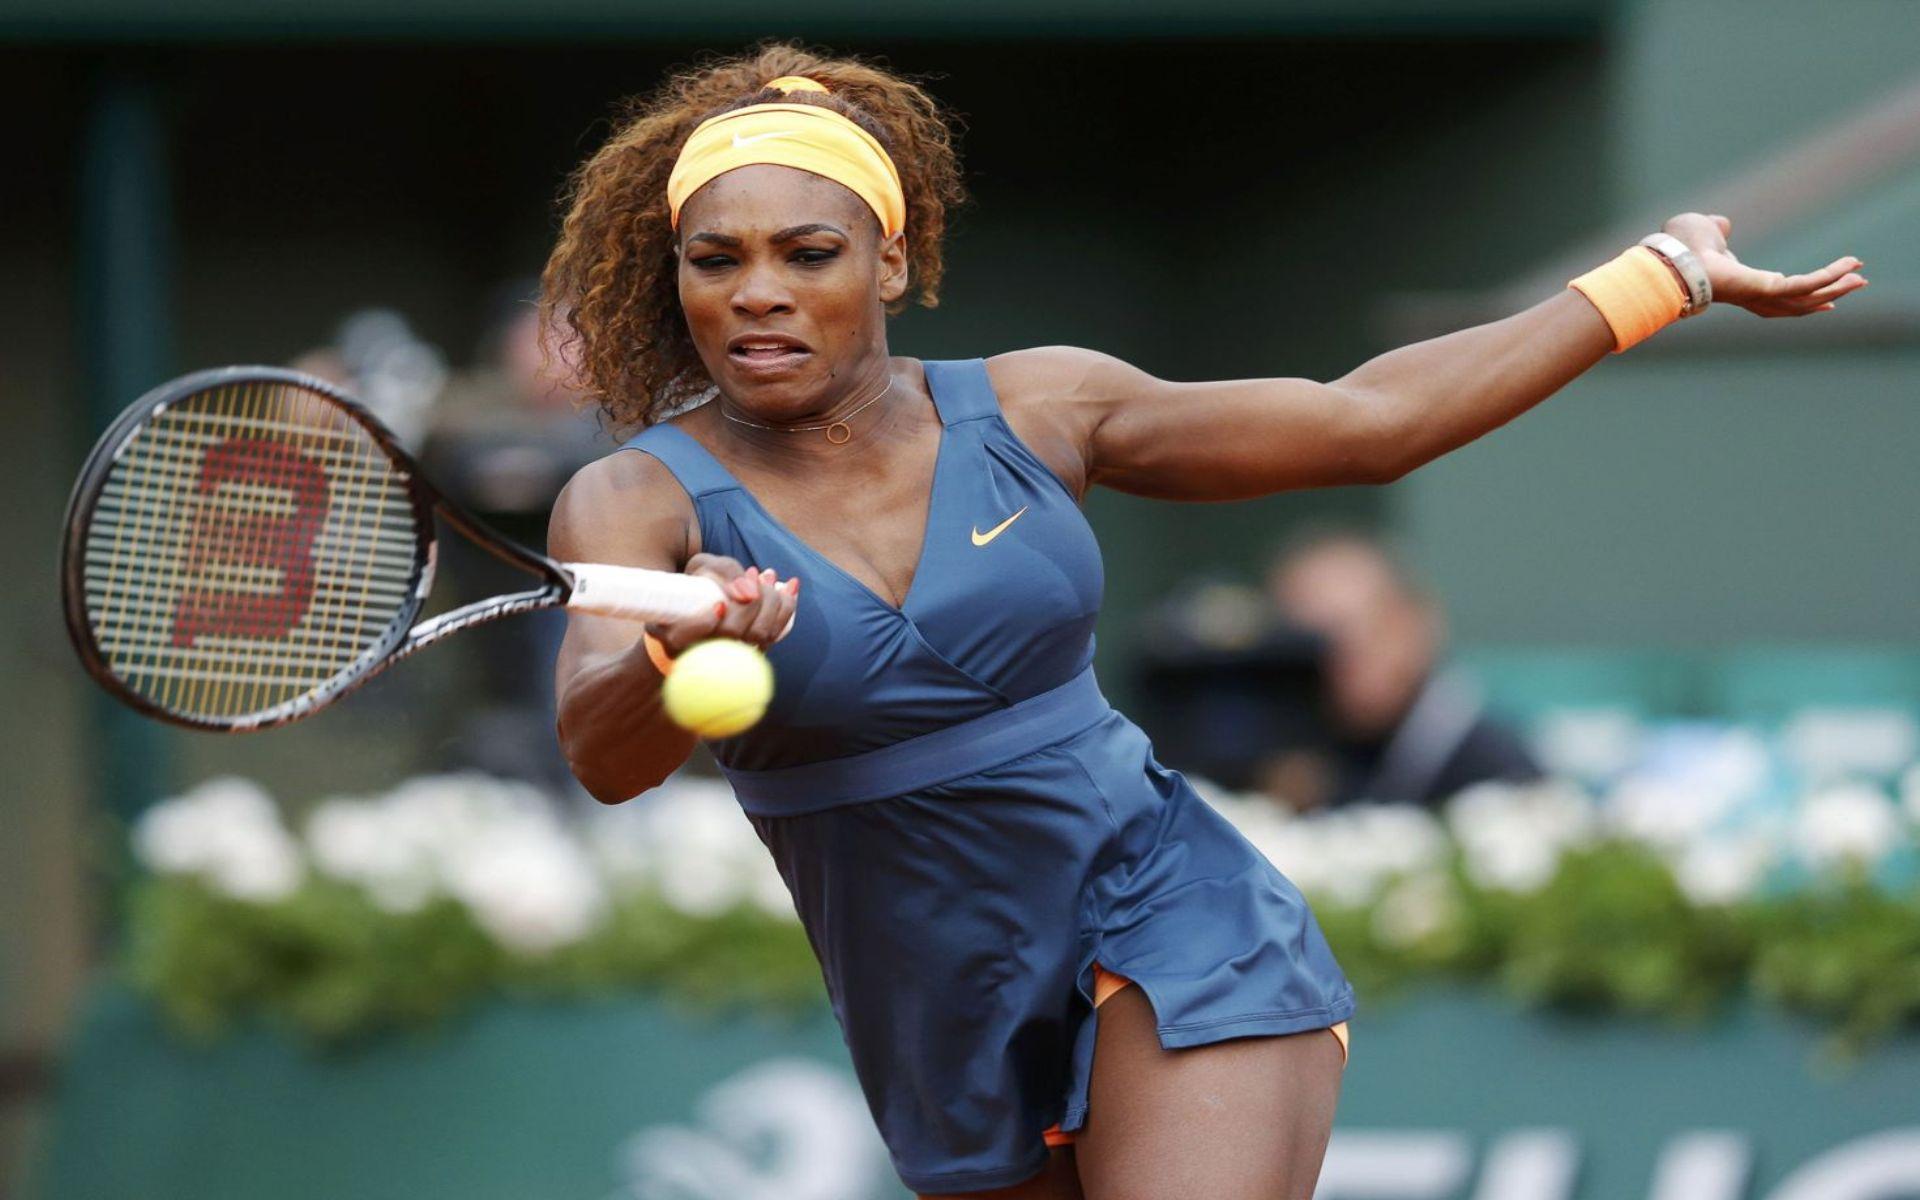 Serena Williams Wallpaper   Serena Williams Wallpaper 41815960 1920x1200